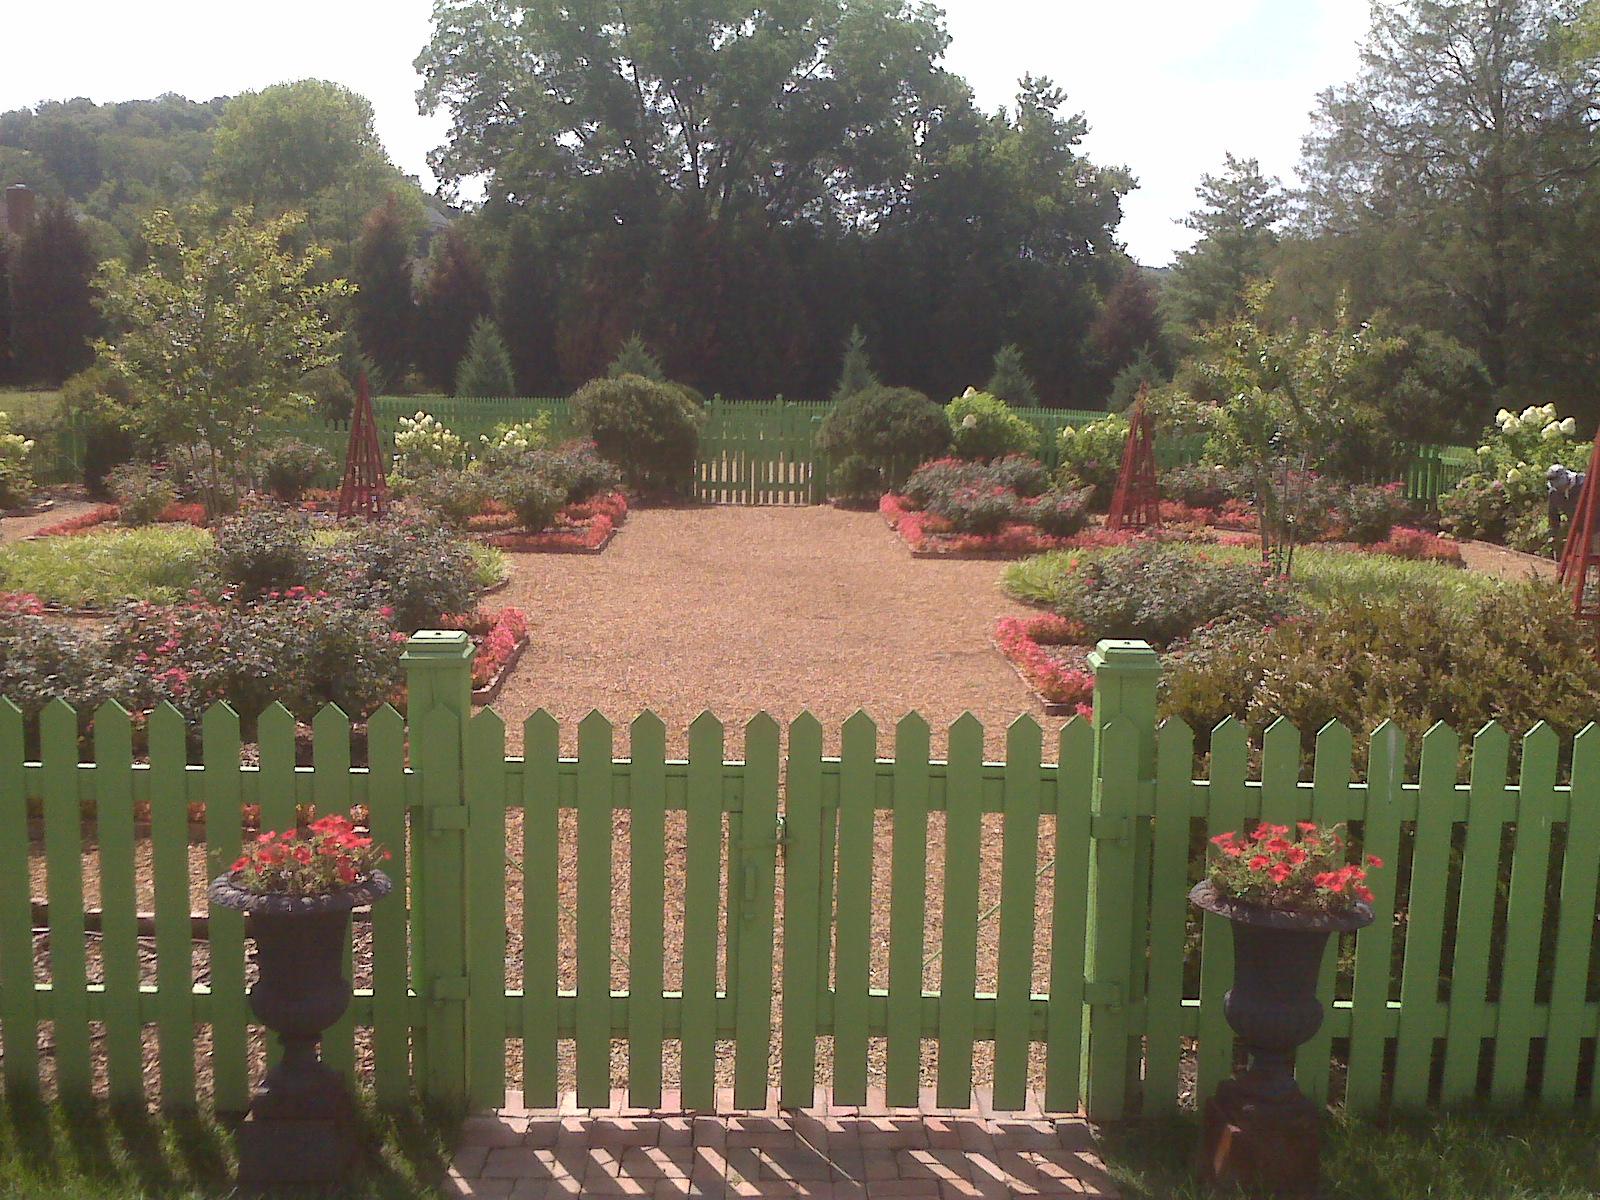 1st garden westward from gates early summer 2010.jpg